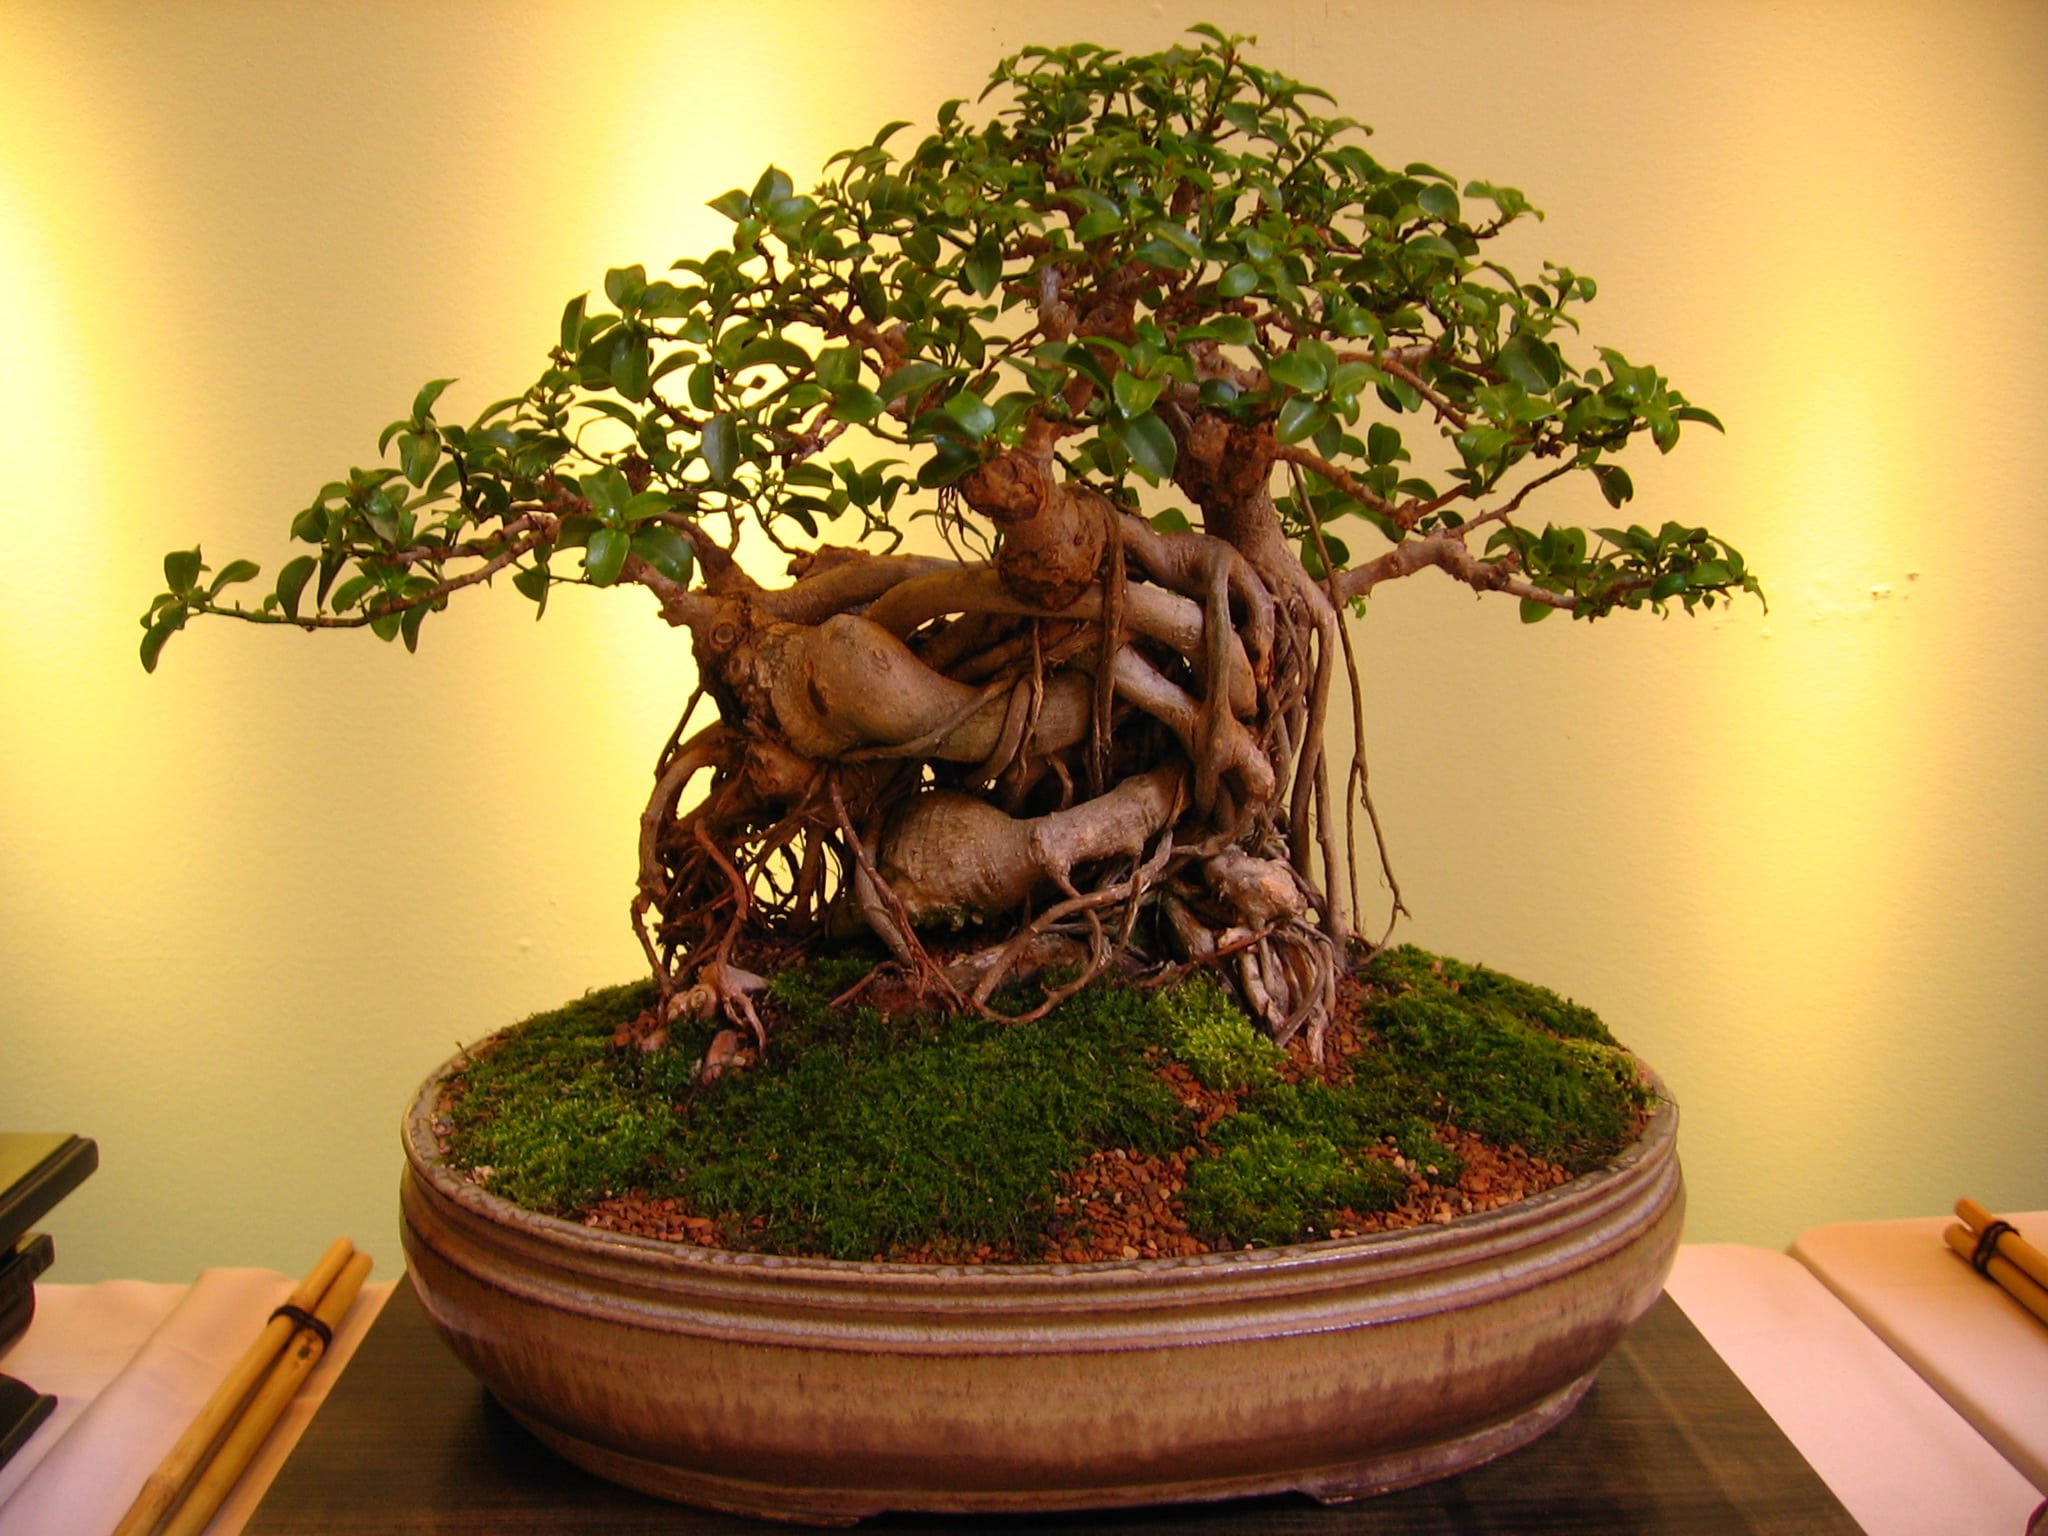 10 things avoid for bonsai tree